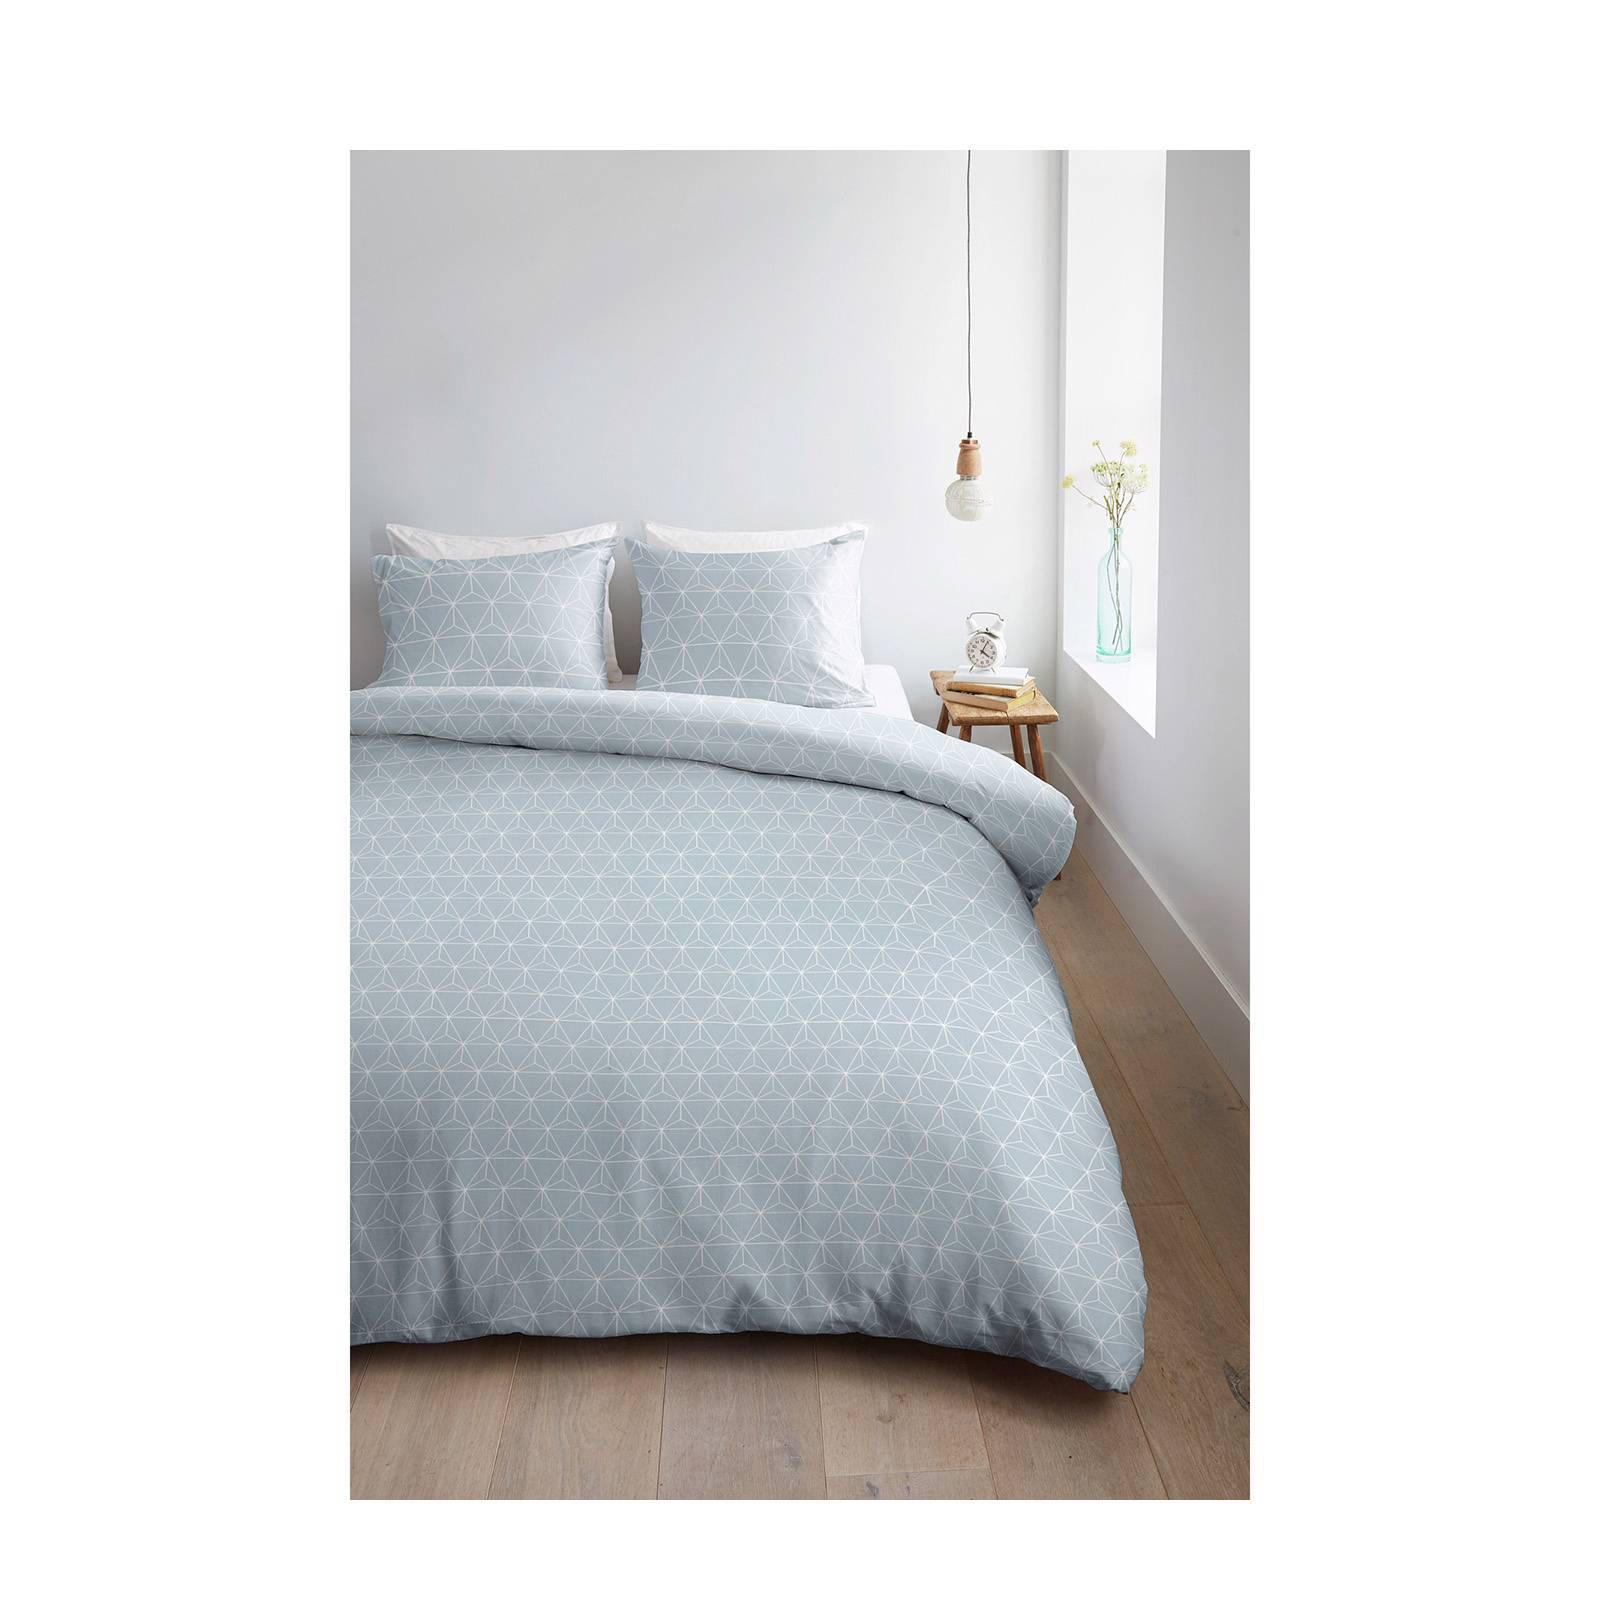 ambiante katoenen dekbedovertrek lits jumeaux lichtblauw